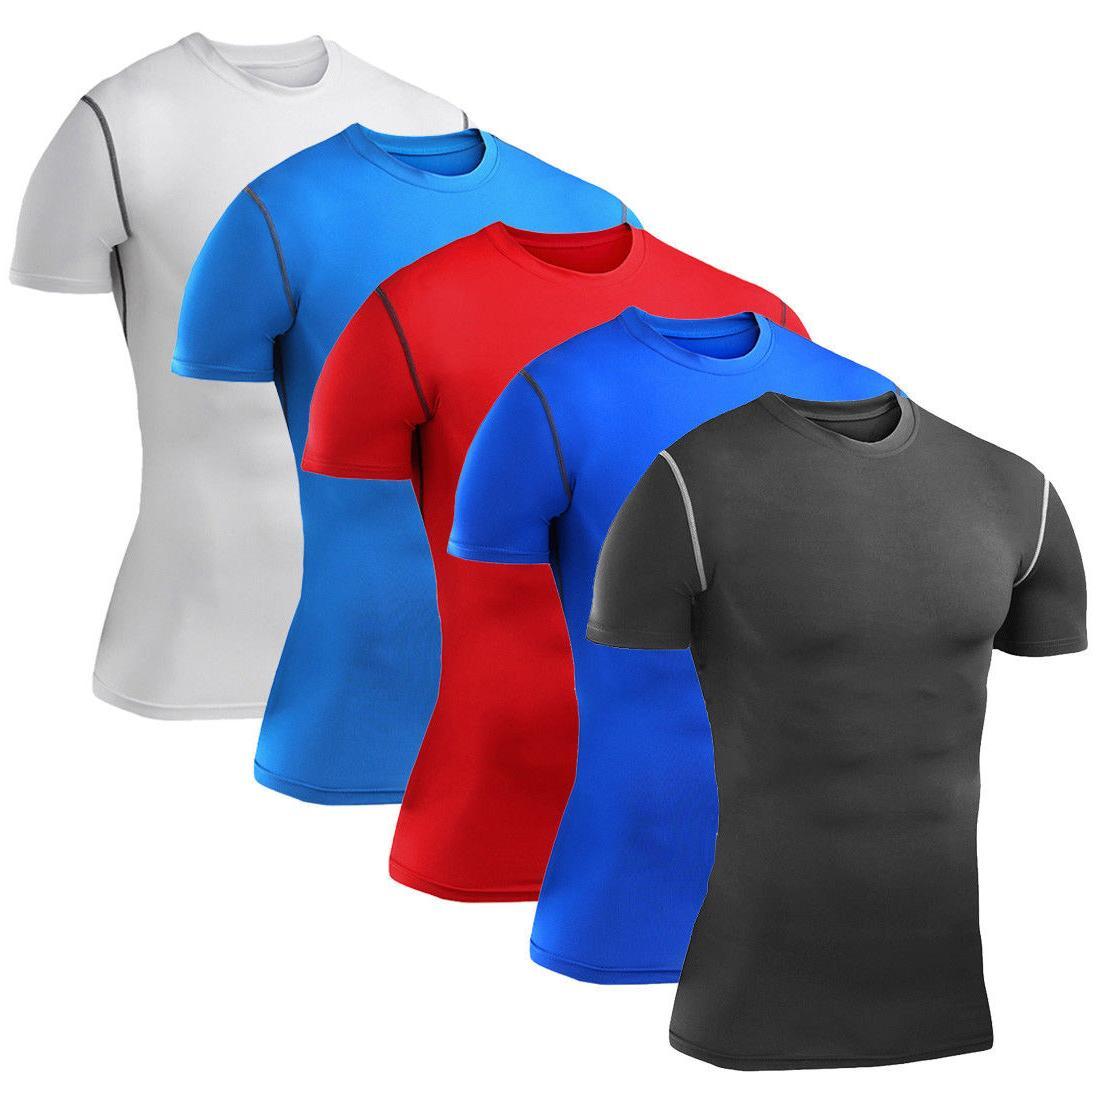 Mens Shirt Vest Pants Gym Clothes Running